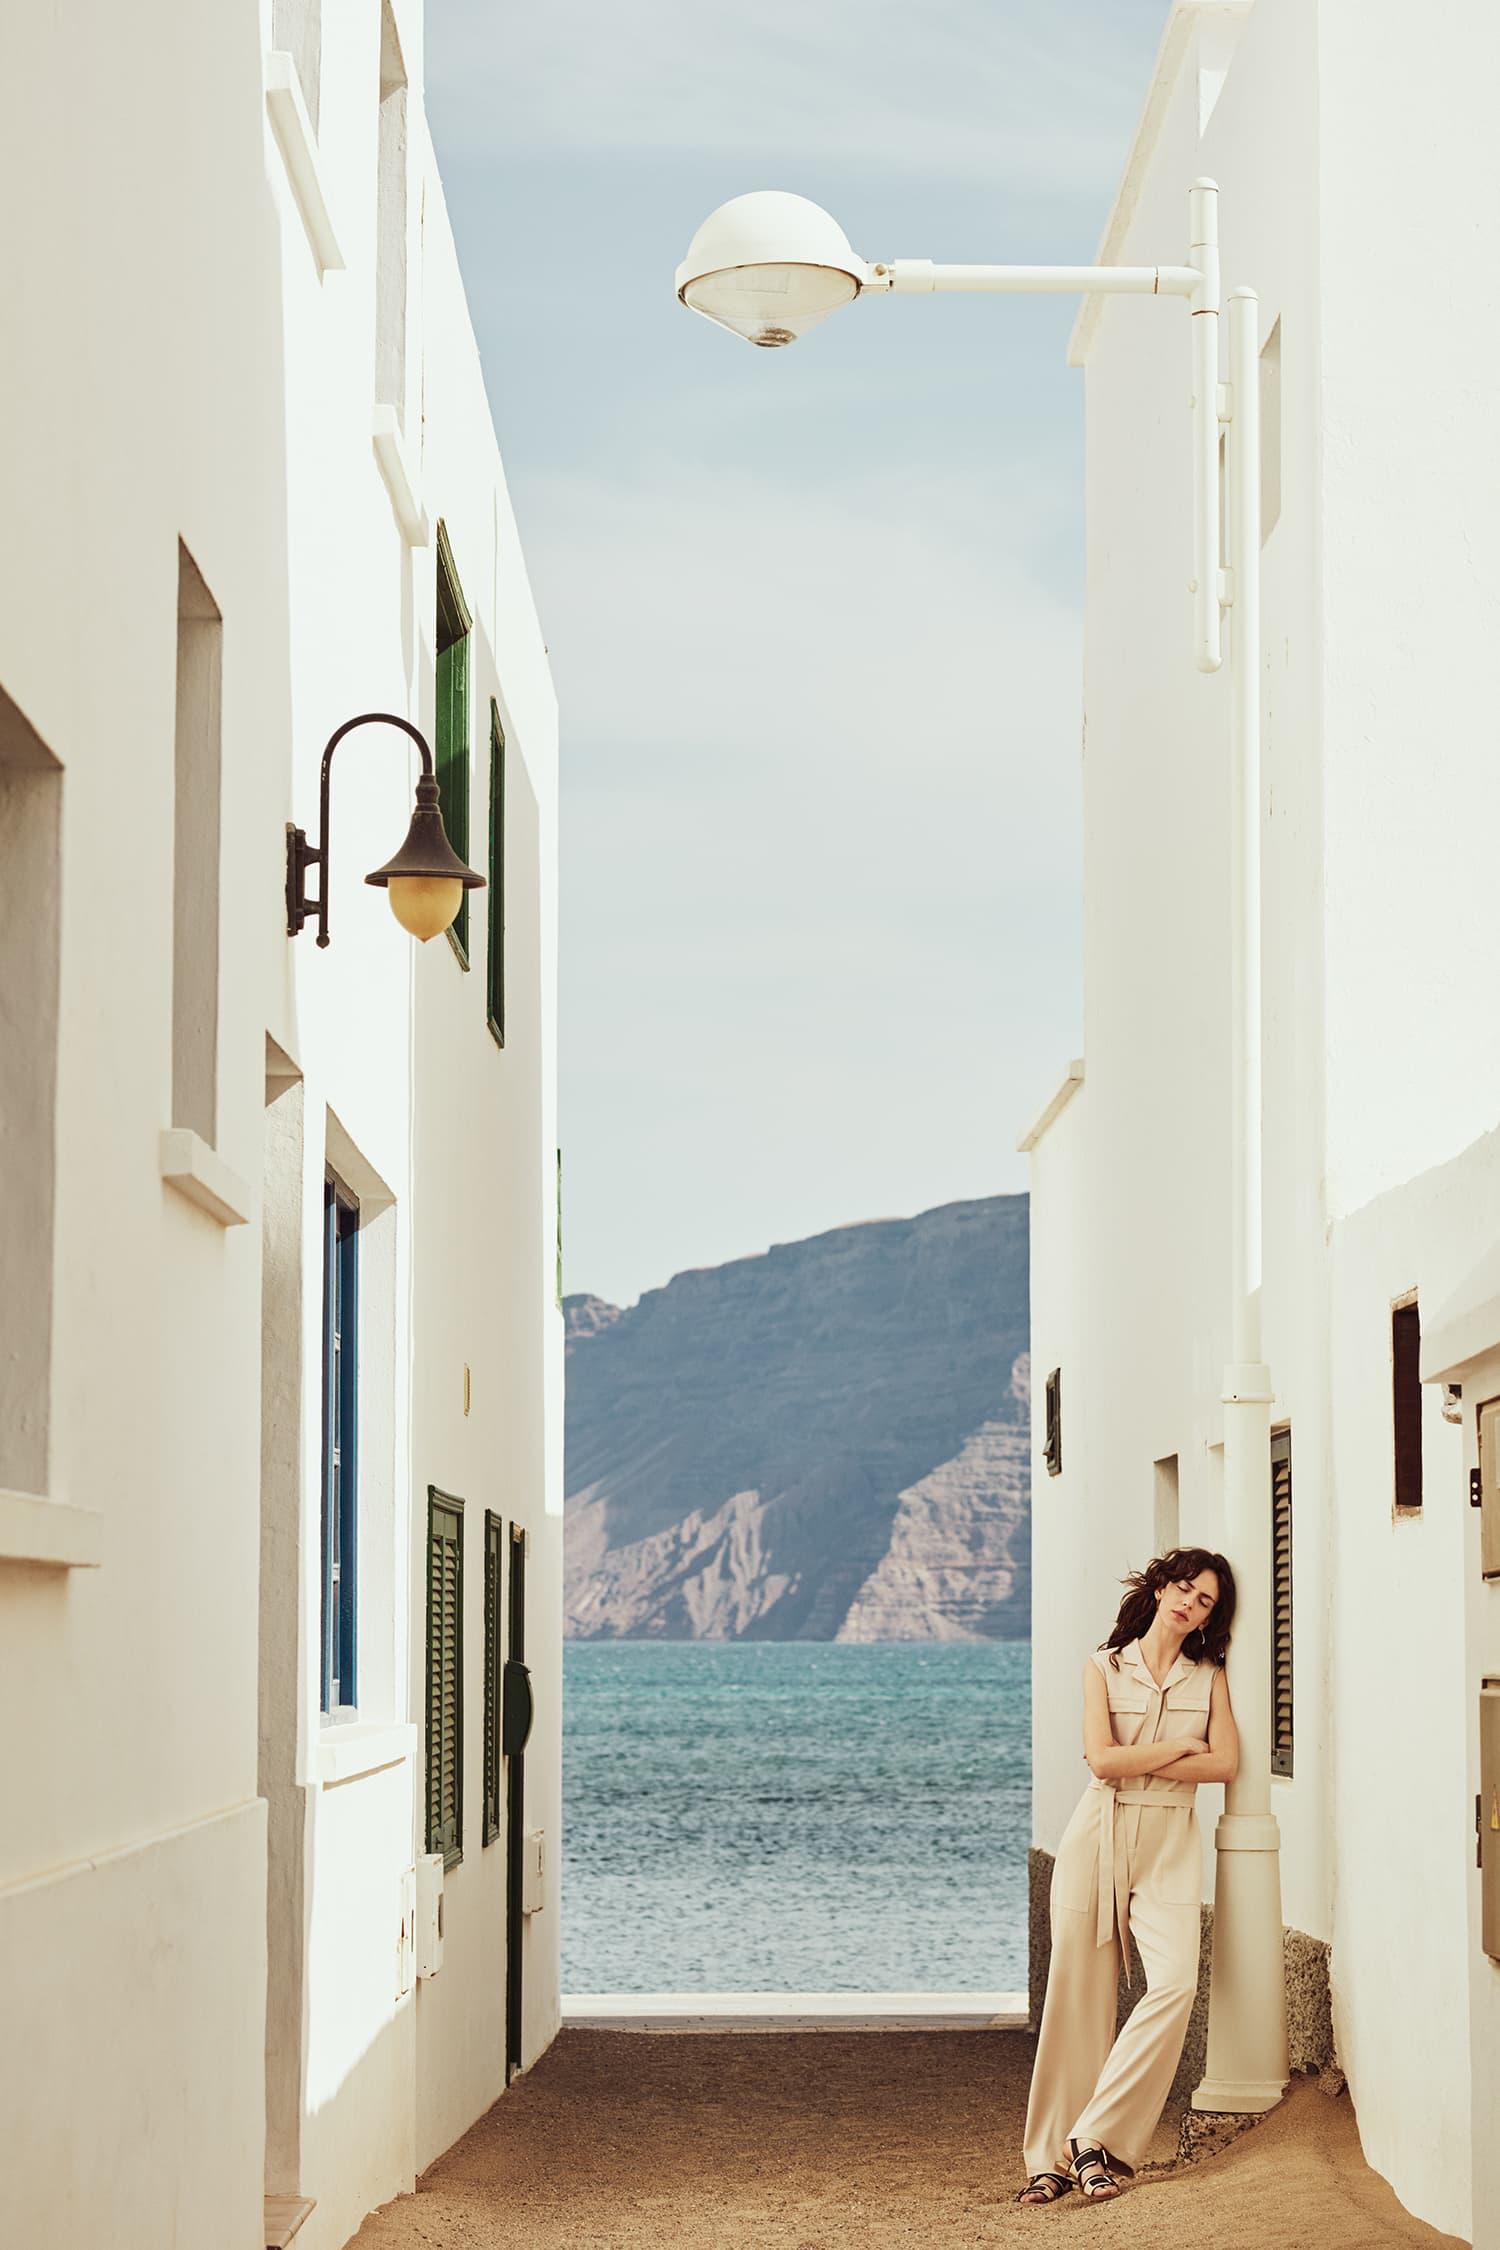 Ida Bjørvik – Rafaela & Adrian in Lanzarote part II